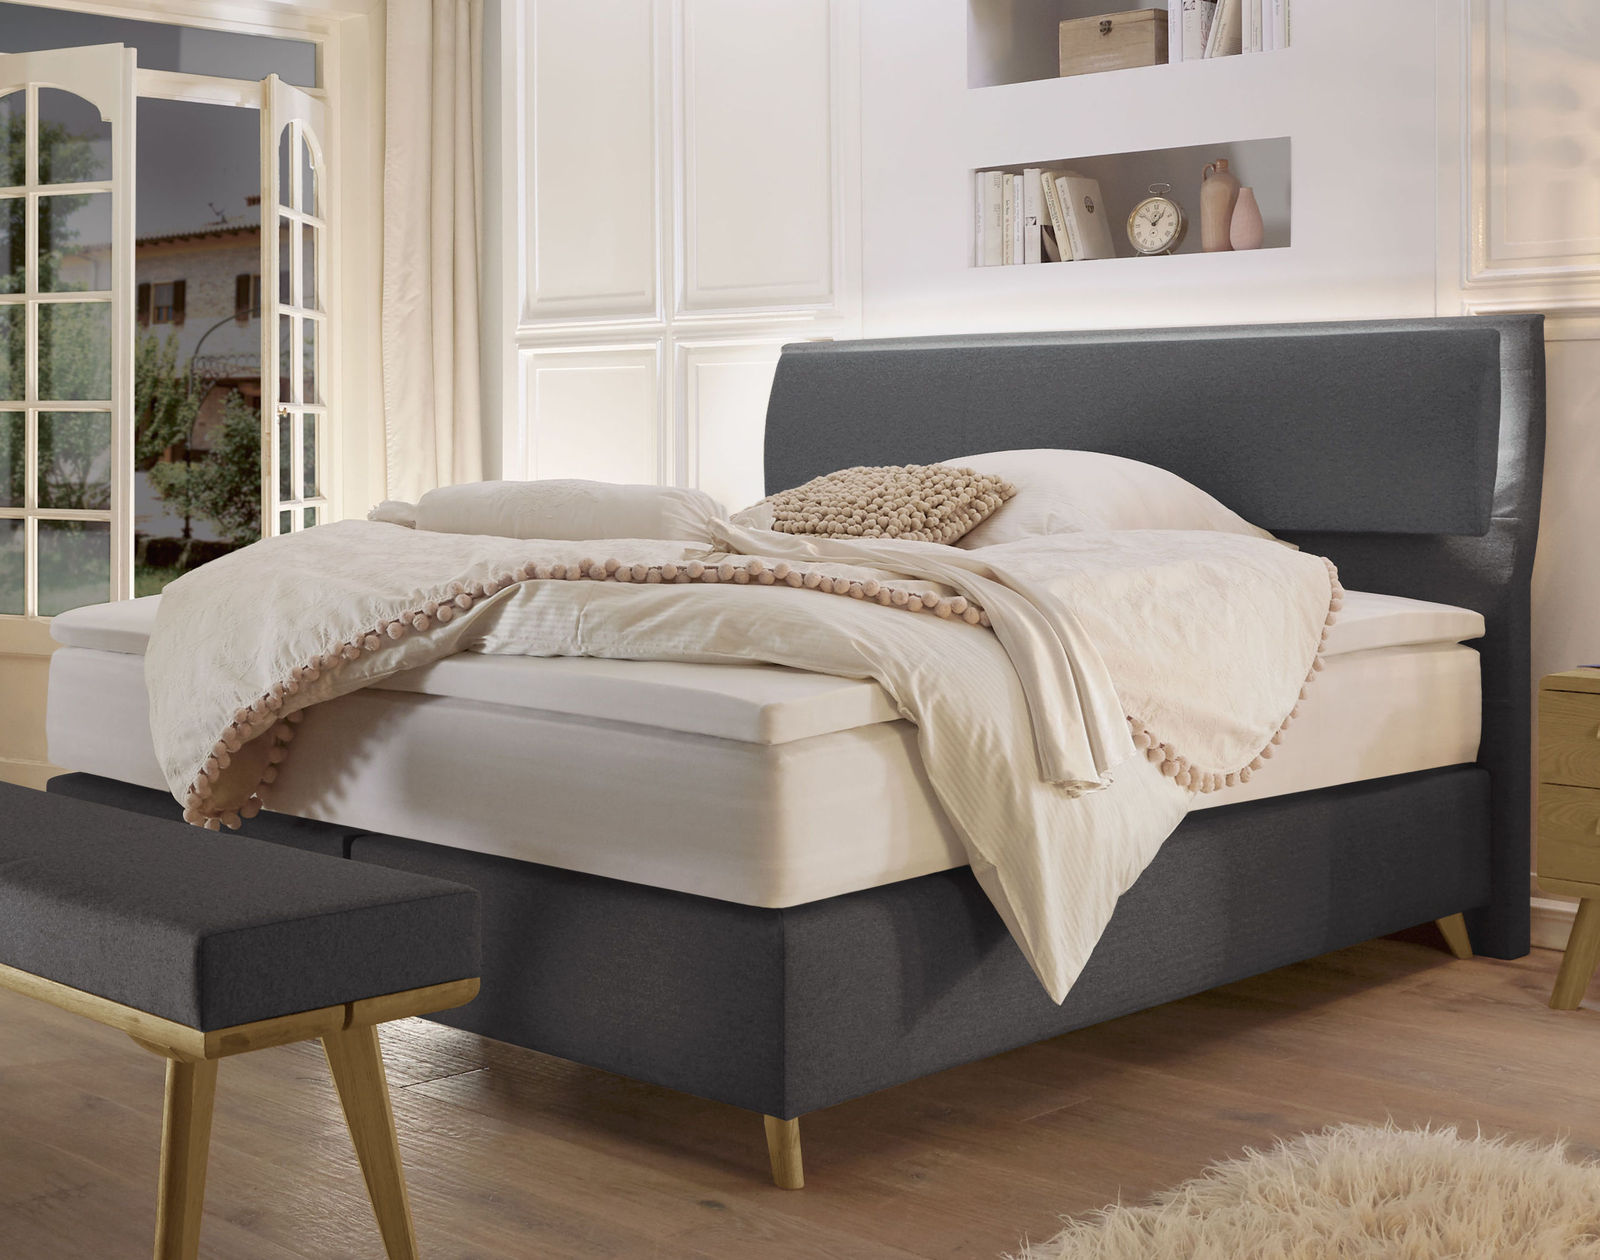 boxspringbett topper bezug boxspringbett ascan 140x200cm bezug schwarz singlebett. Black Bedroom Furniture Sets. Home Design Ideas